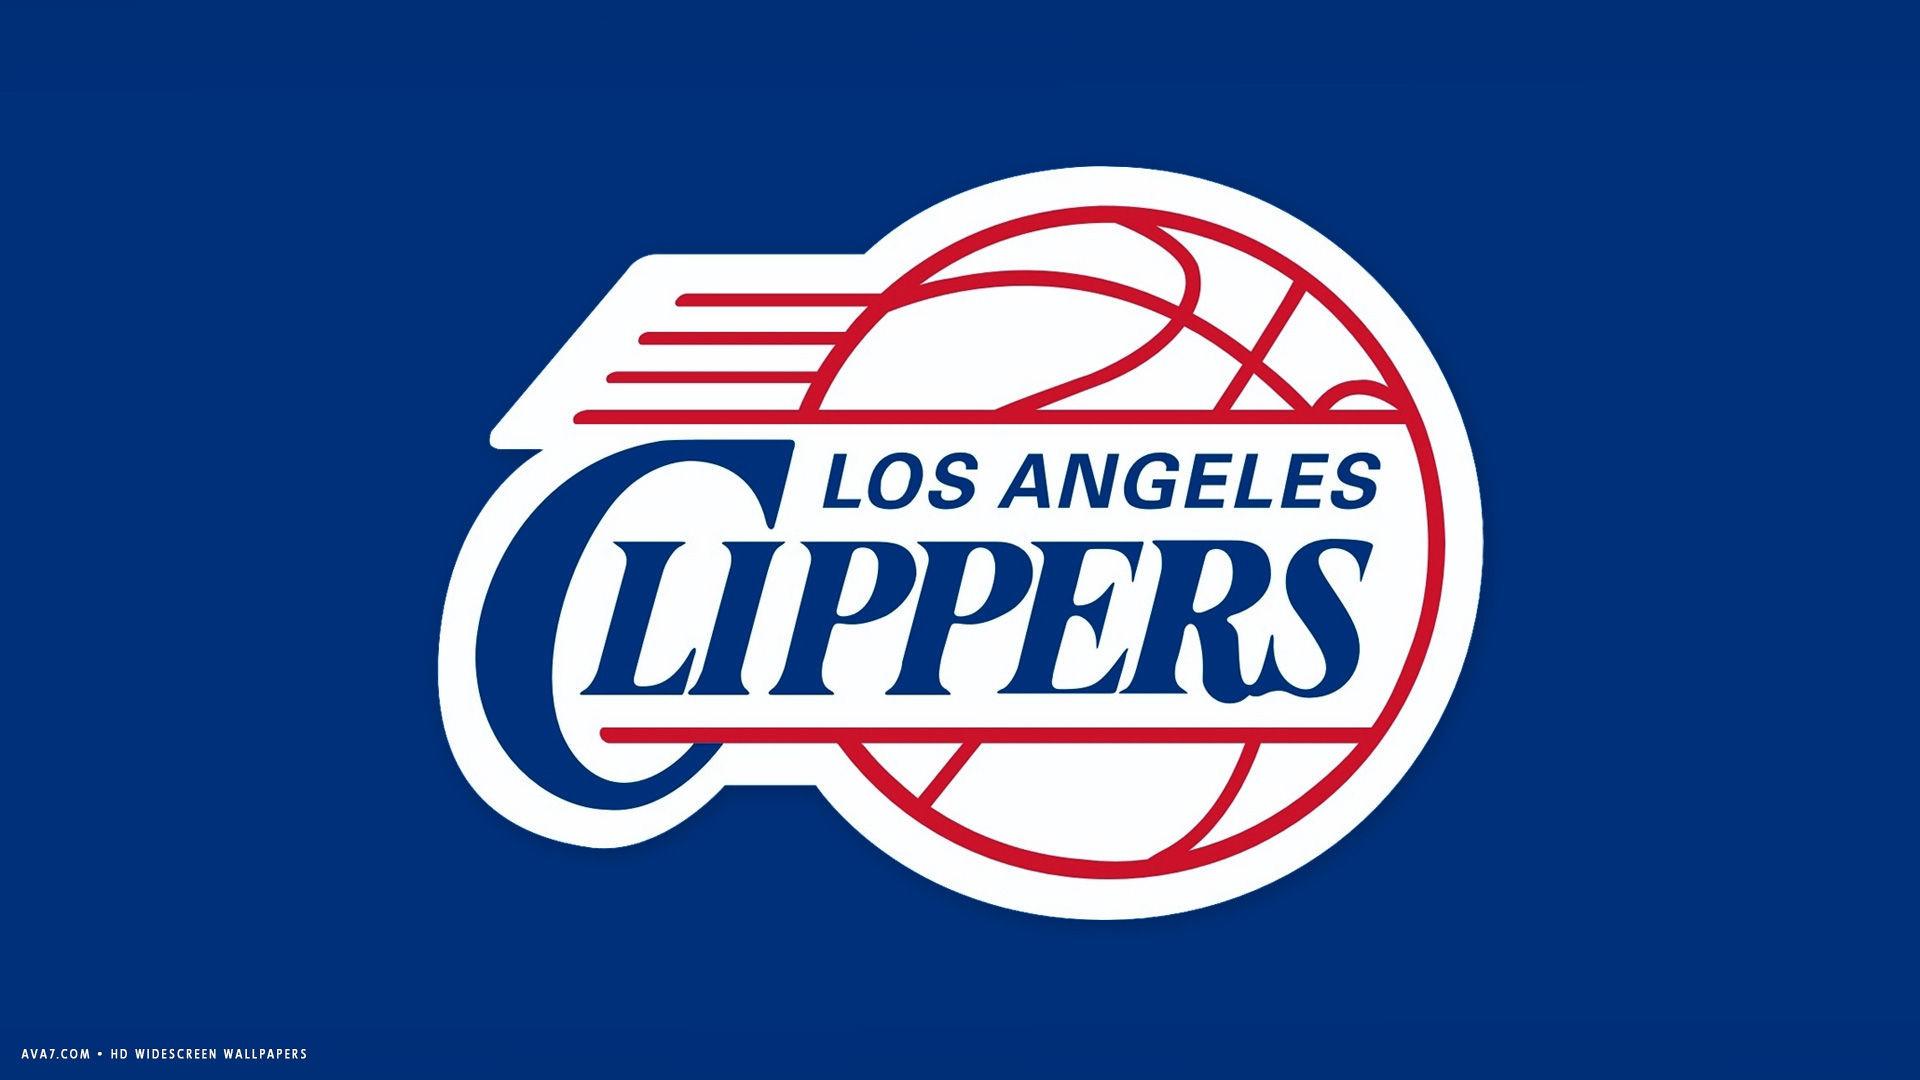 Res: 1920x1080, los angeles clippers nba basketball team hd widescreen wallpaper